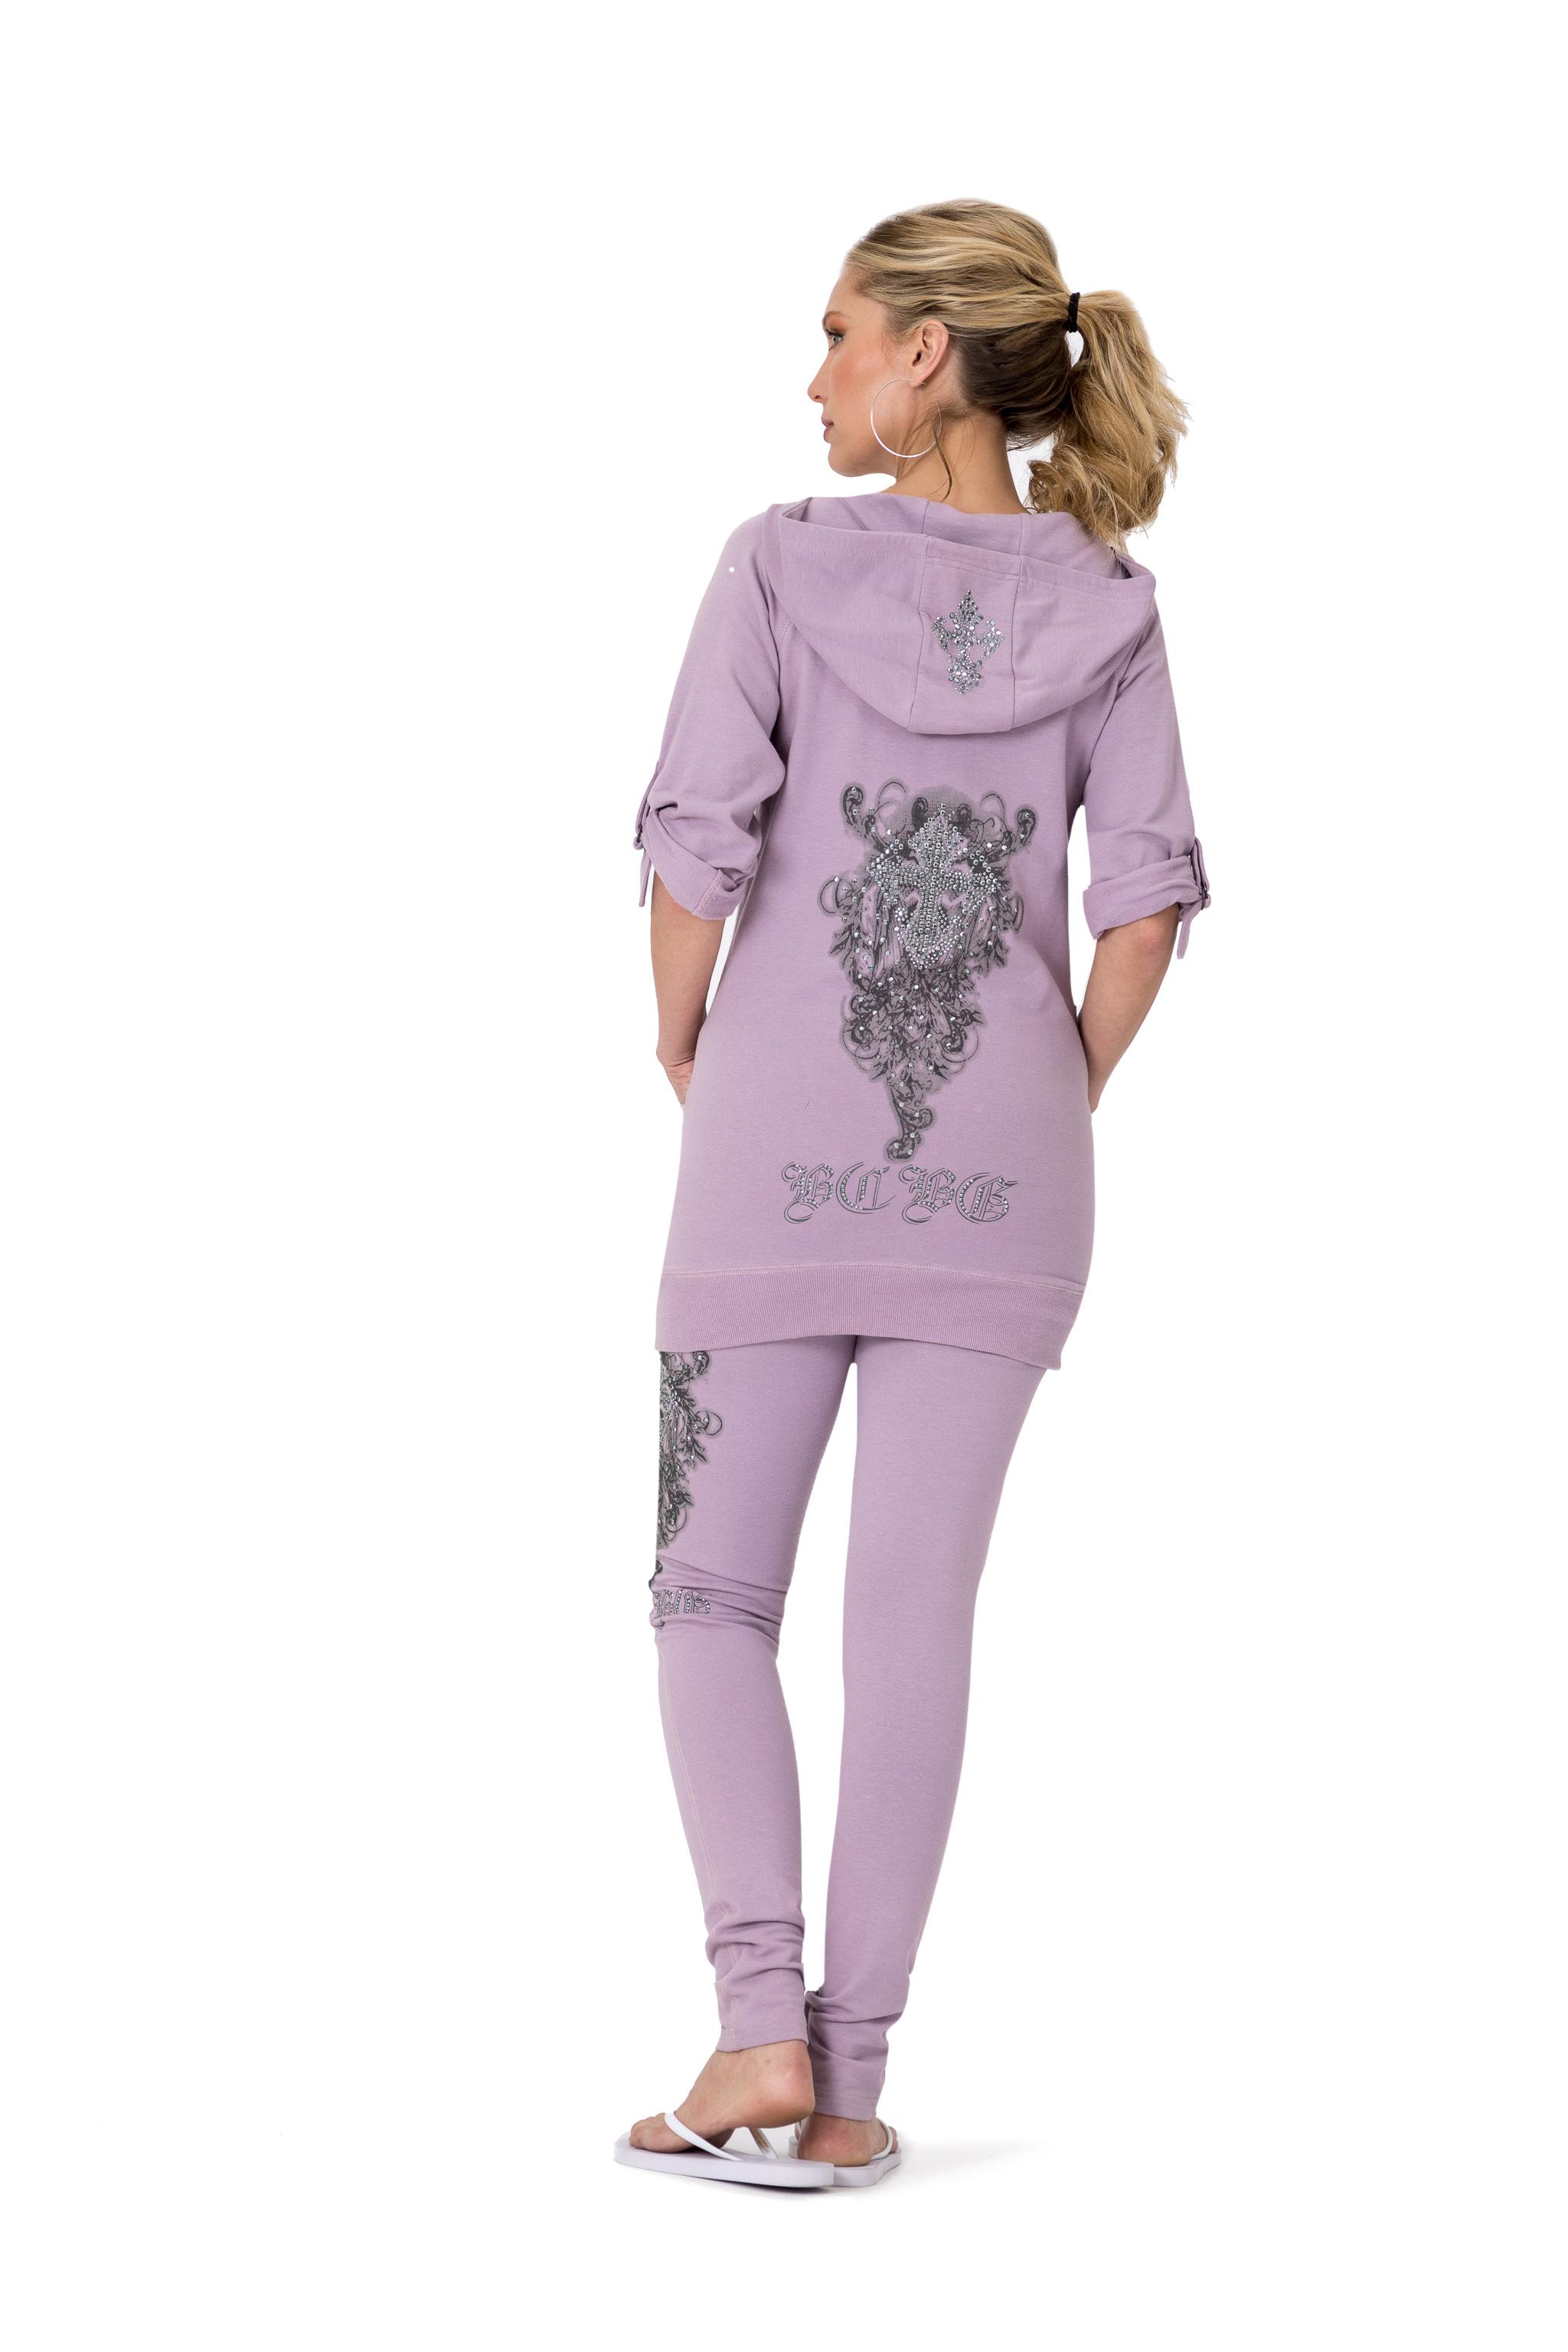 BCBG-Women-039-s-Lounge-Wear-2-Piece-Embellished-Jacket-and-Pants-Jogger-Set thumbnail 4